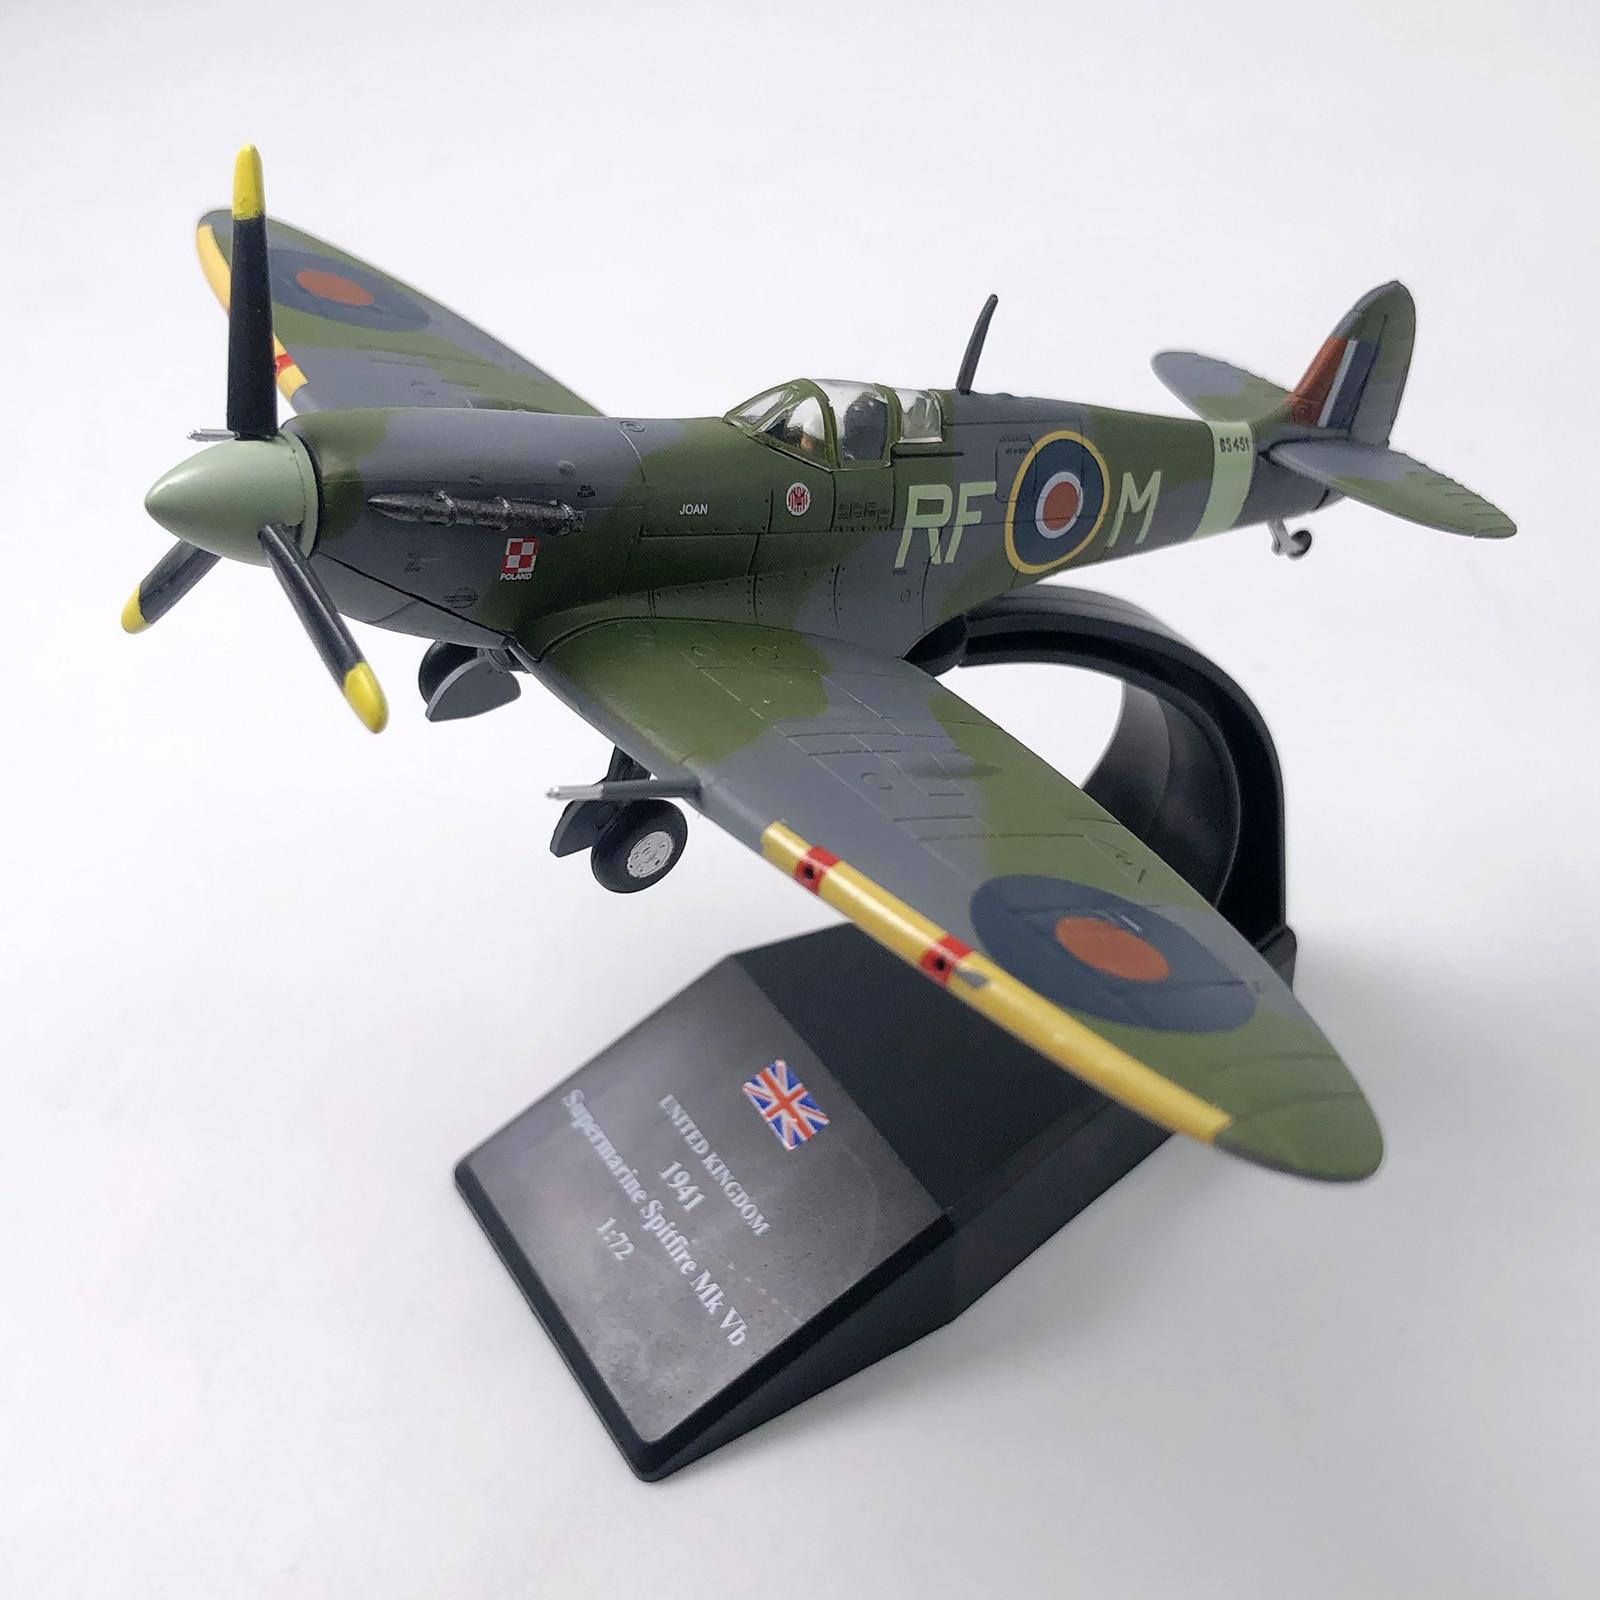 1/72 Scale WWII British Fighter Plane Airplane Diecast Metal Plane Aircraft Model Children Toy